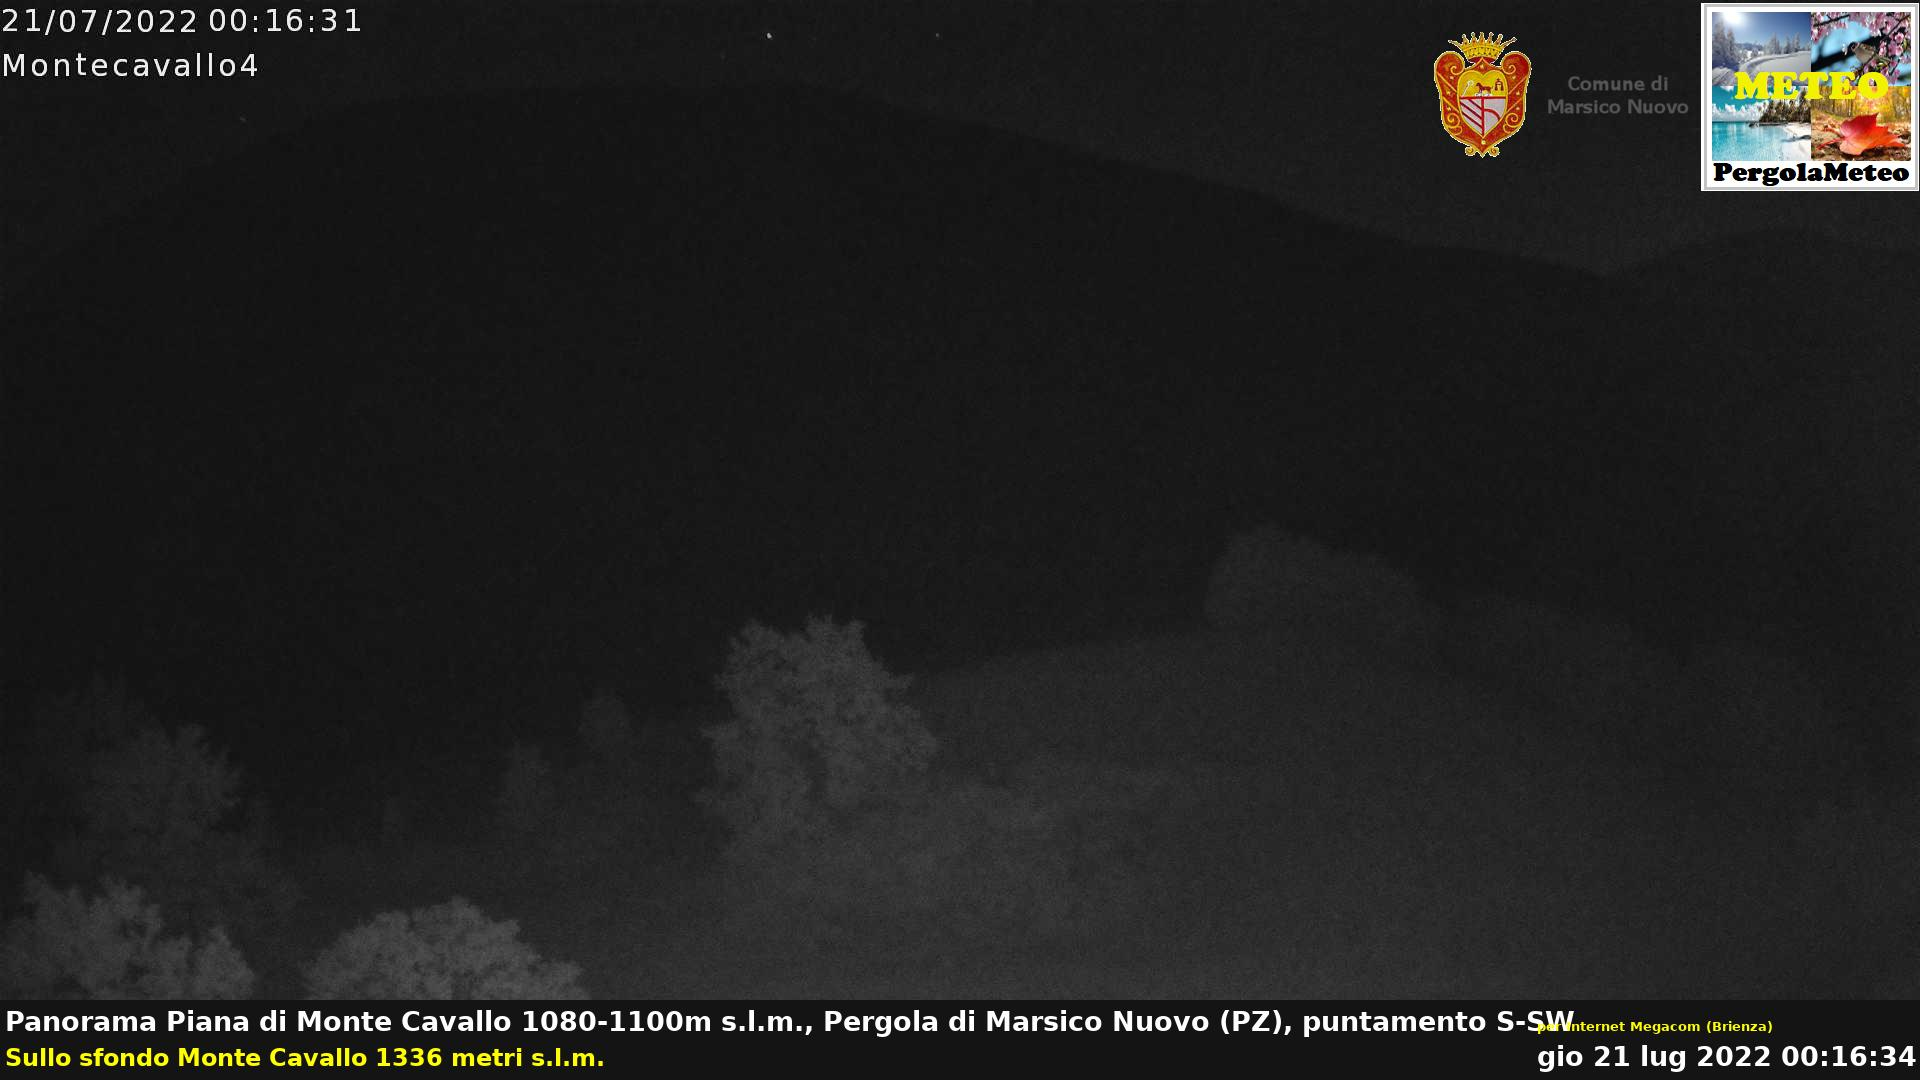 http://www.pergolameteo.it/joomla/montecavallo4/FI9928P_00626EED50B5/snap/webcam.php